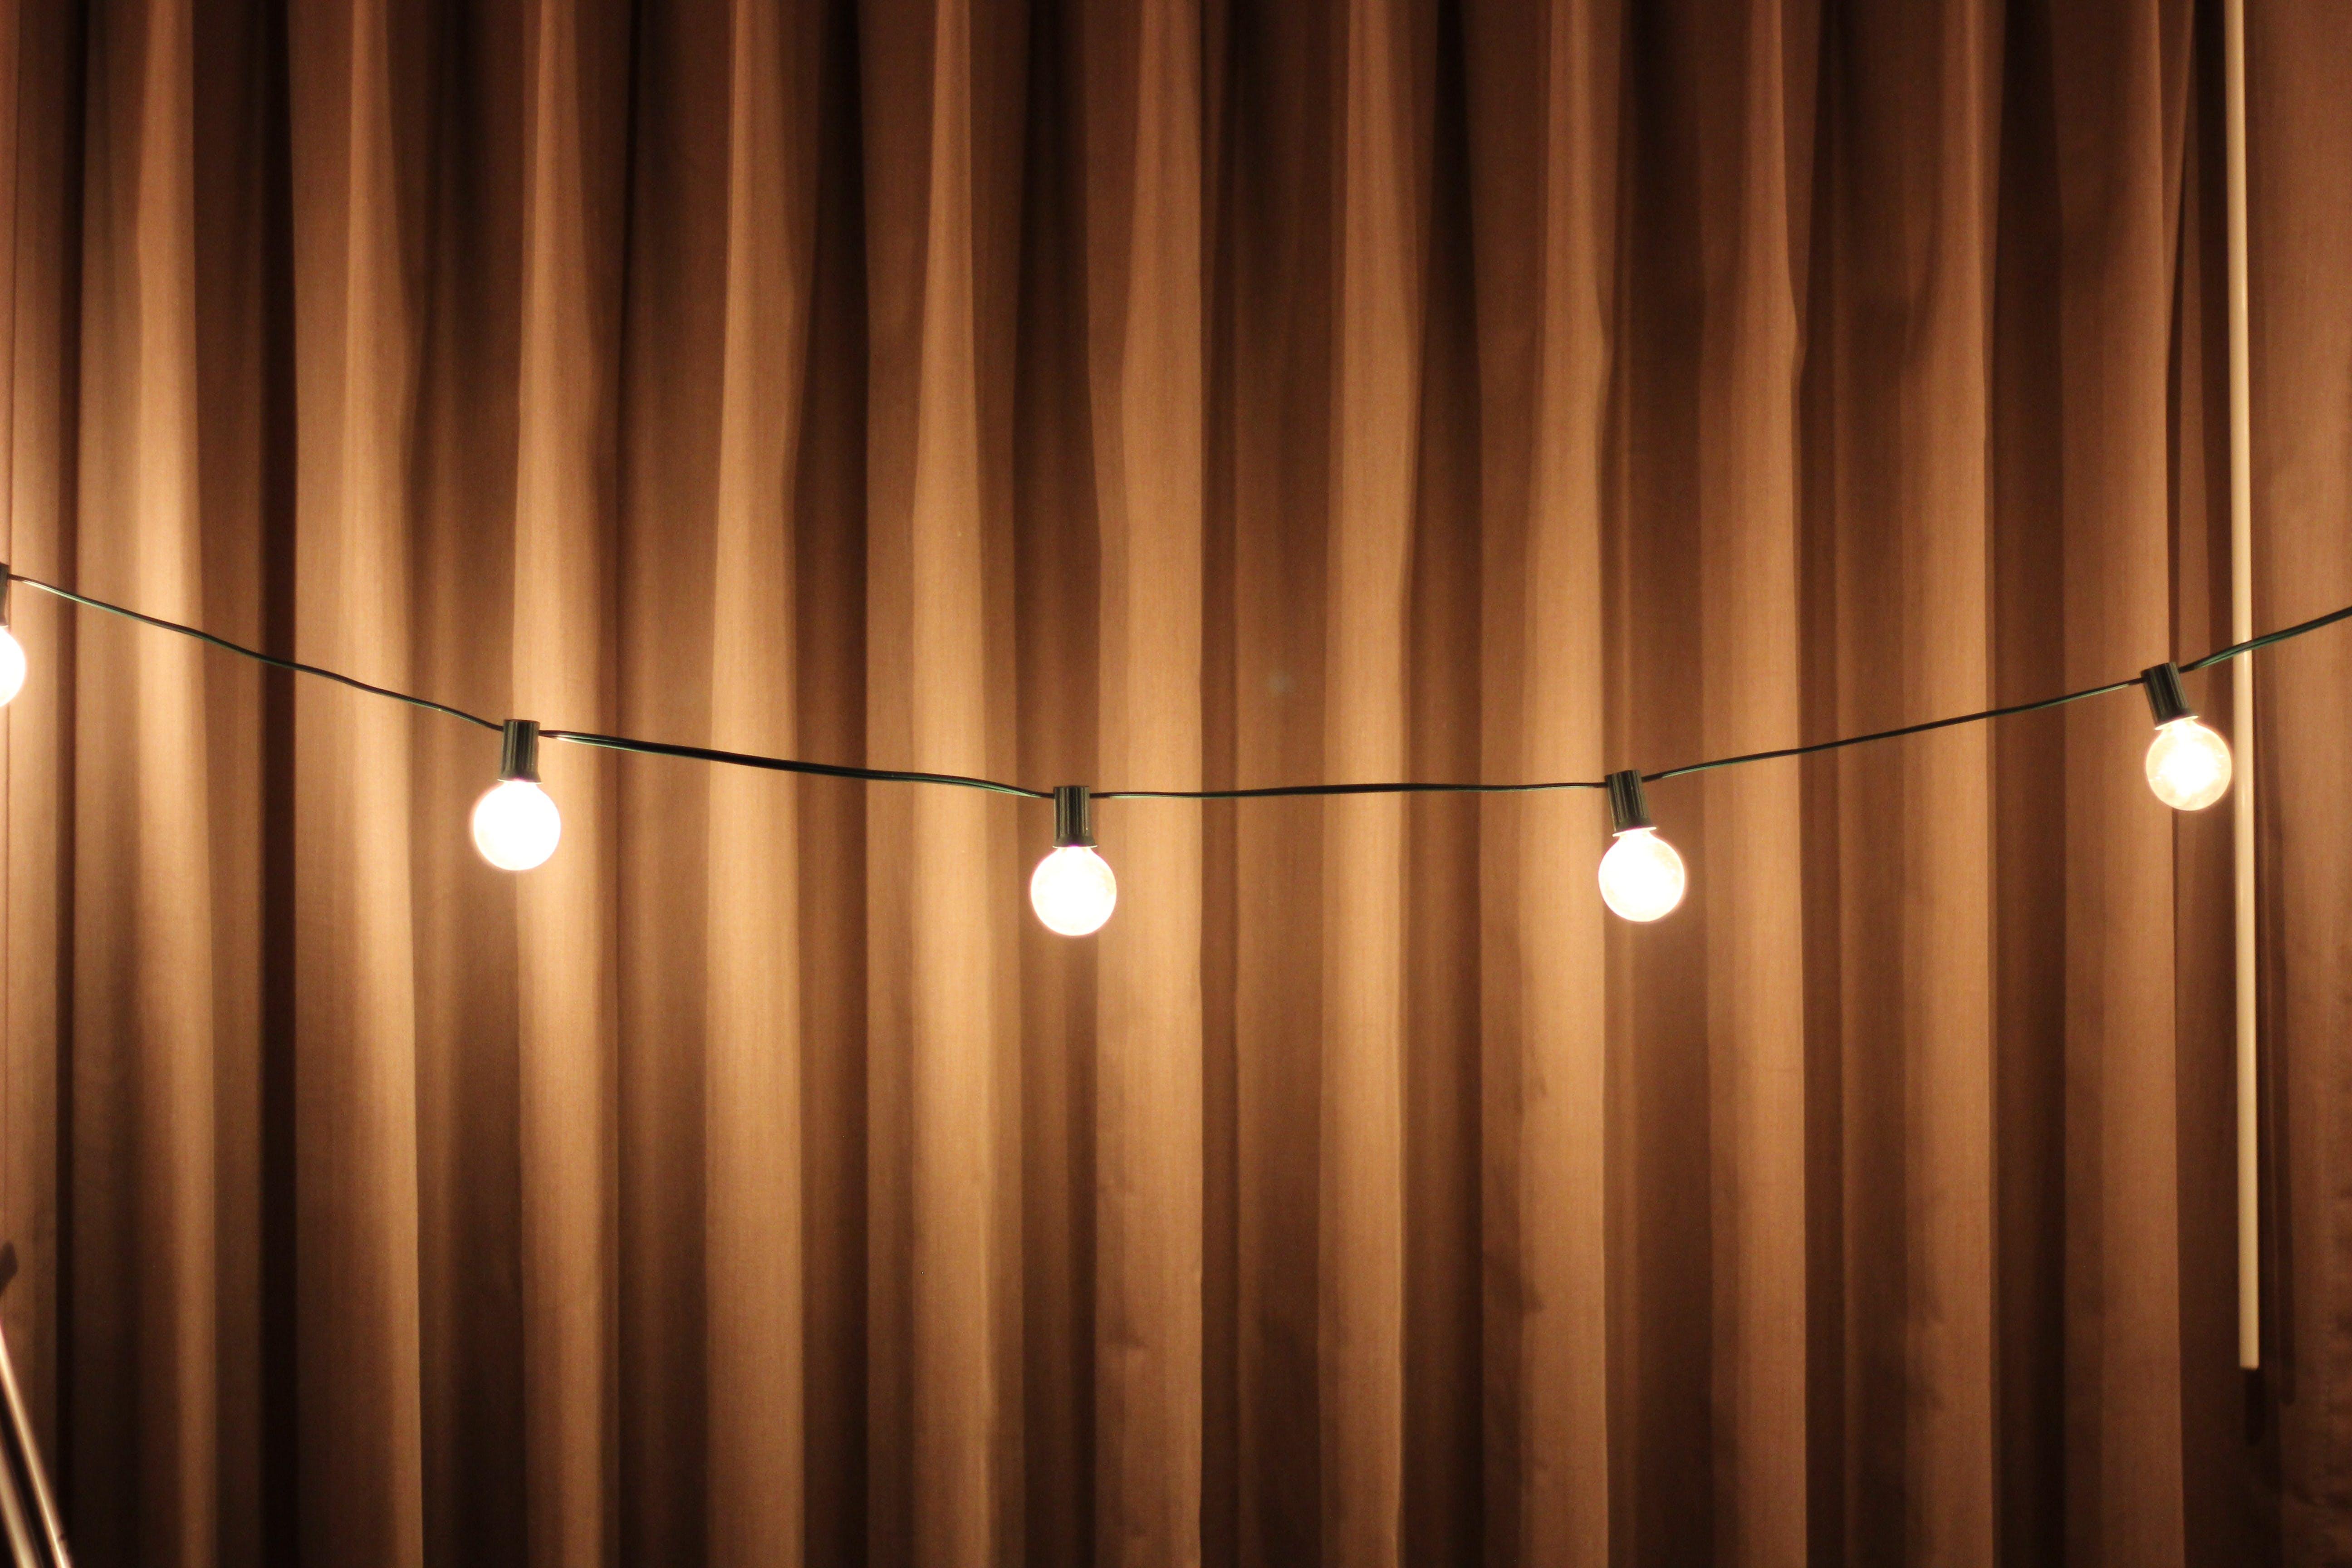 Black String Lights Beside Brown Curtain